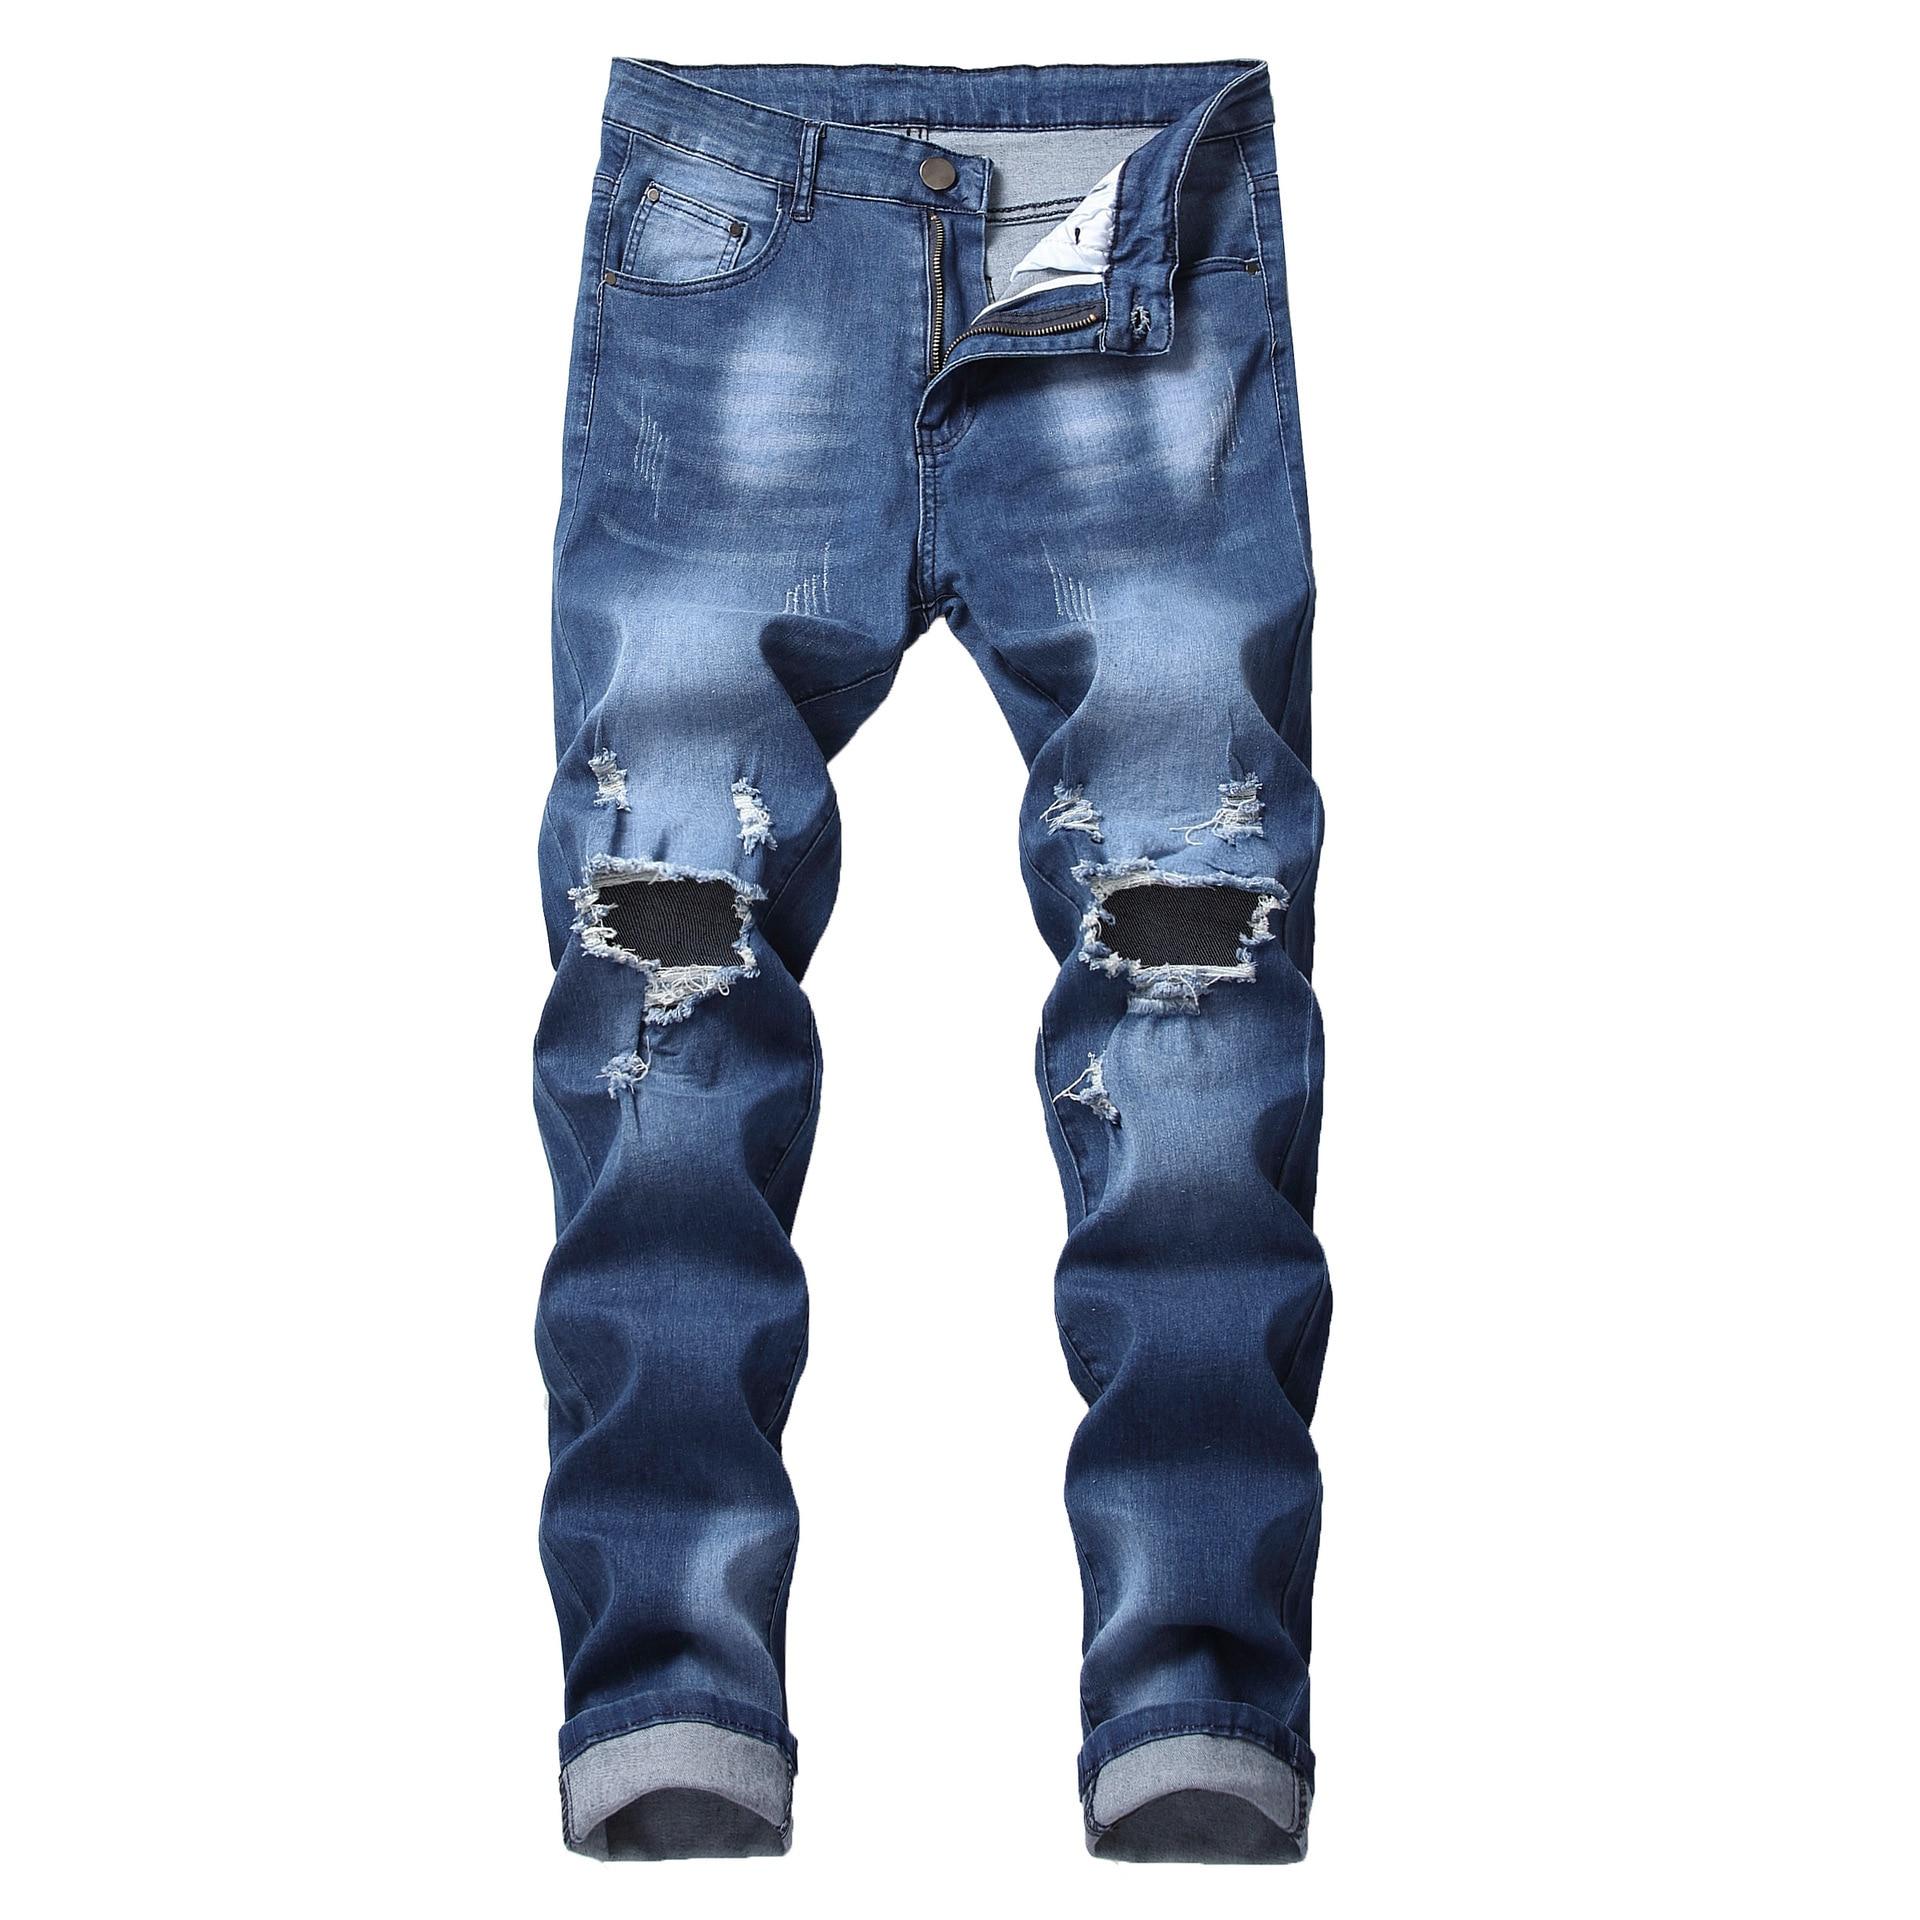 Men   Jeans   Men's Vintage Slim Fit Printed Slim Fit Stretchy Skinny Tight Biker Moto Younger-Looking Pants